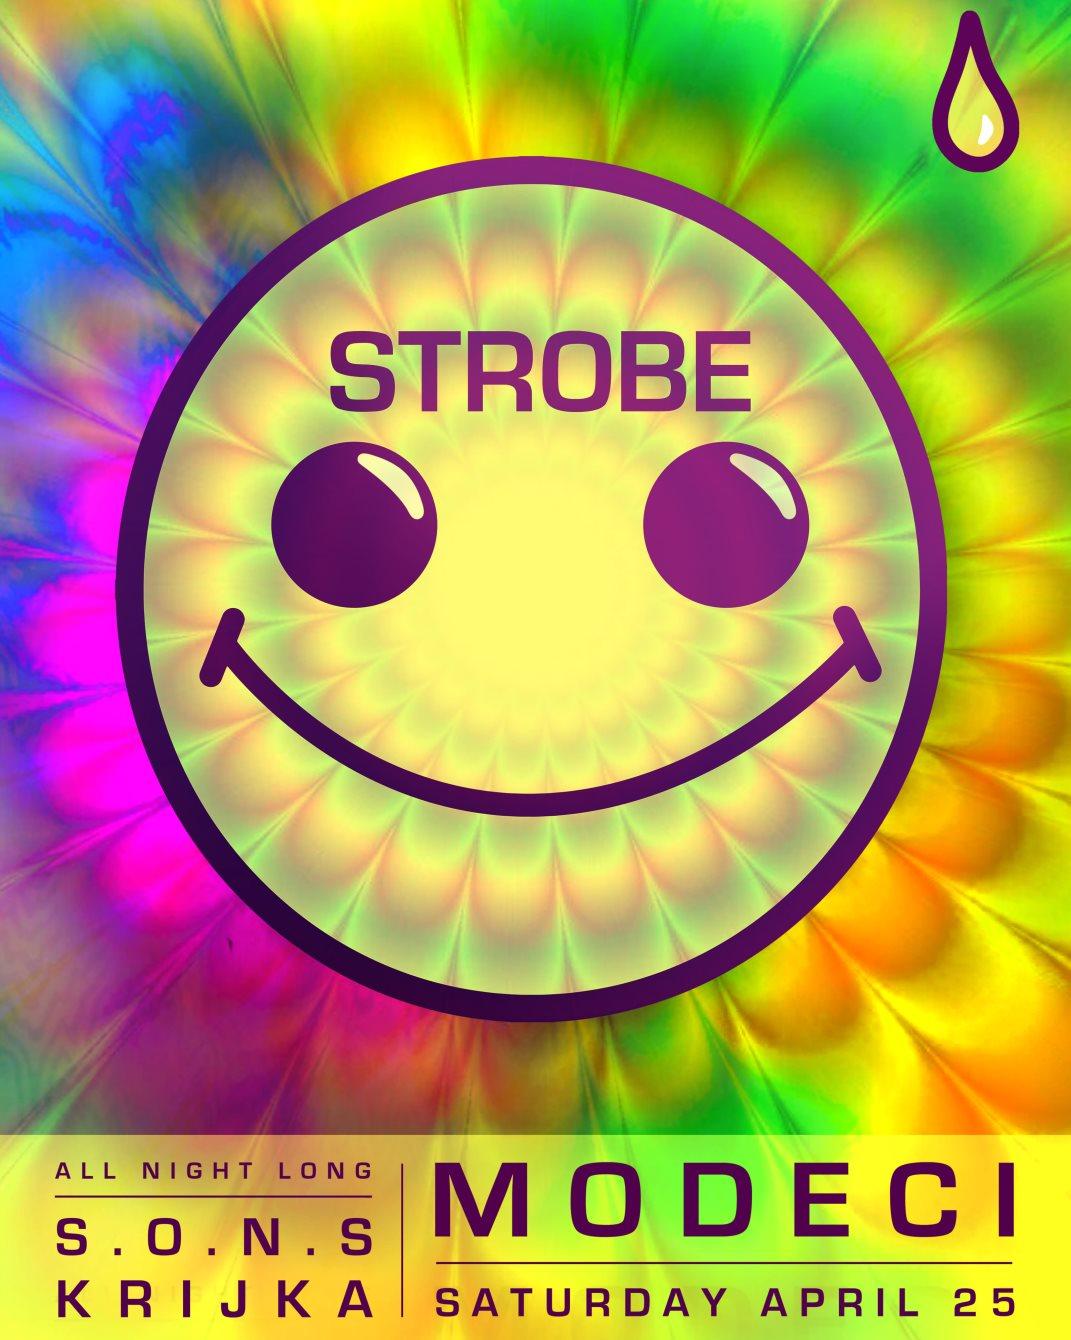 Strobe: We Are Back - Flyer front